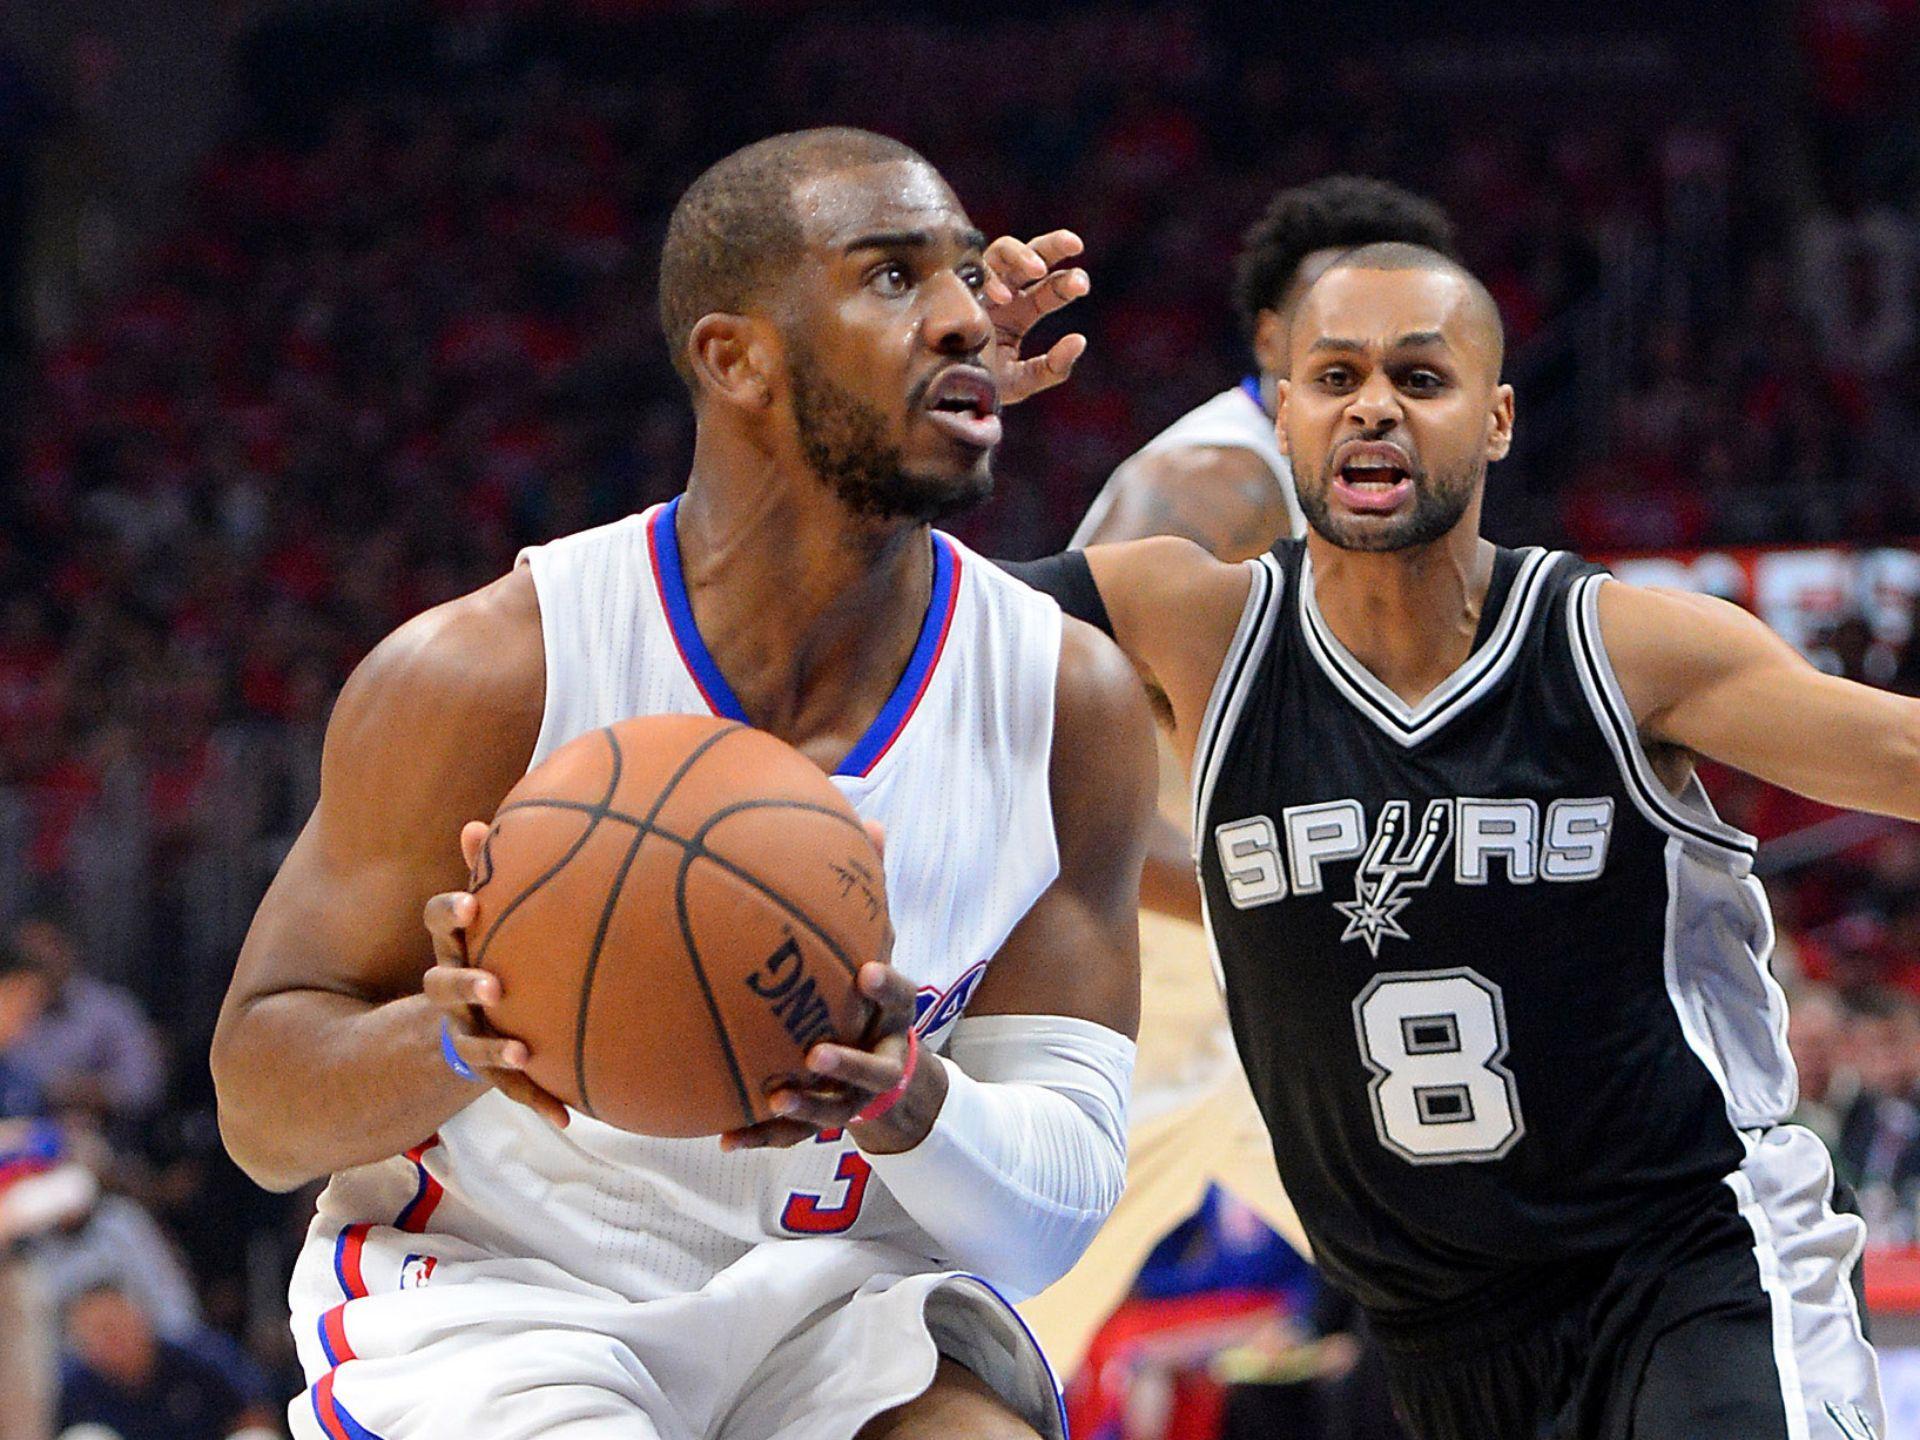 Game 7 In Los Angeles San Antonio Spurs Guard Patty Mills 8 Guards Los Angeles Clippers Guard Chris Paul 3 Jayne Kamin Oncea Usa Today Sports